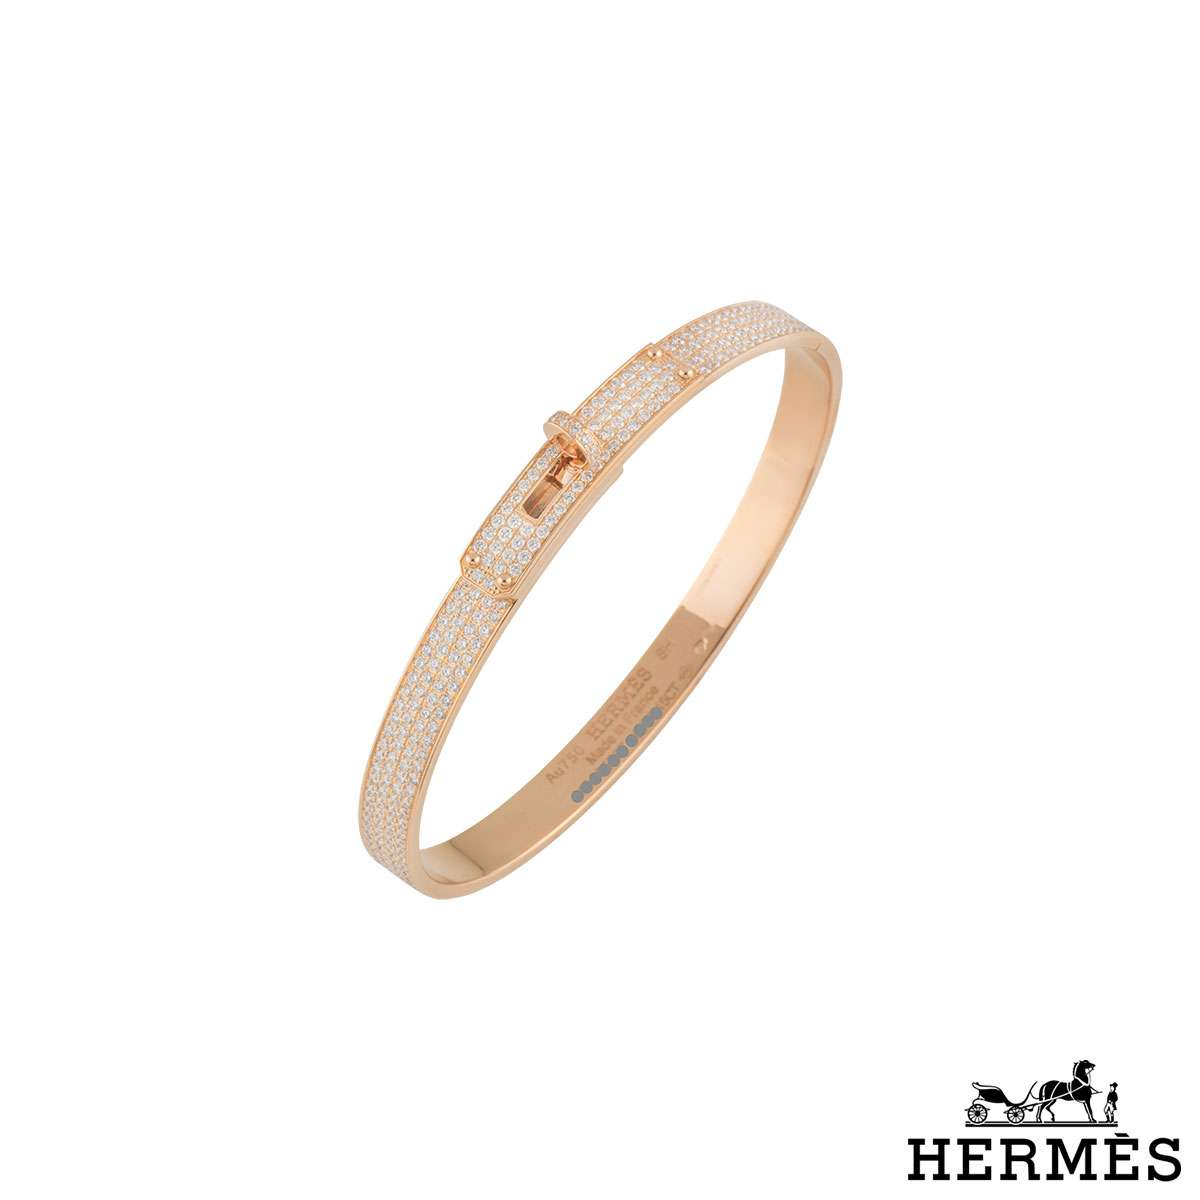 Hermes Rose Gold Diamond Kelly Bangle H109500B 00SH